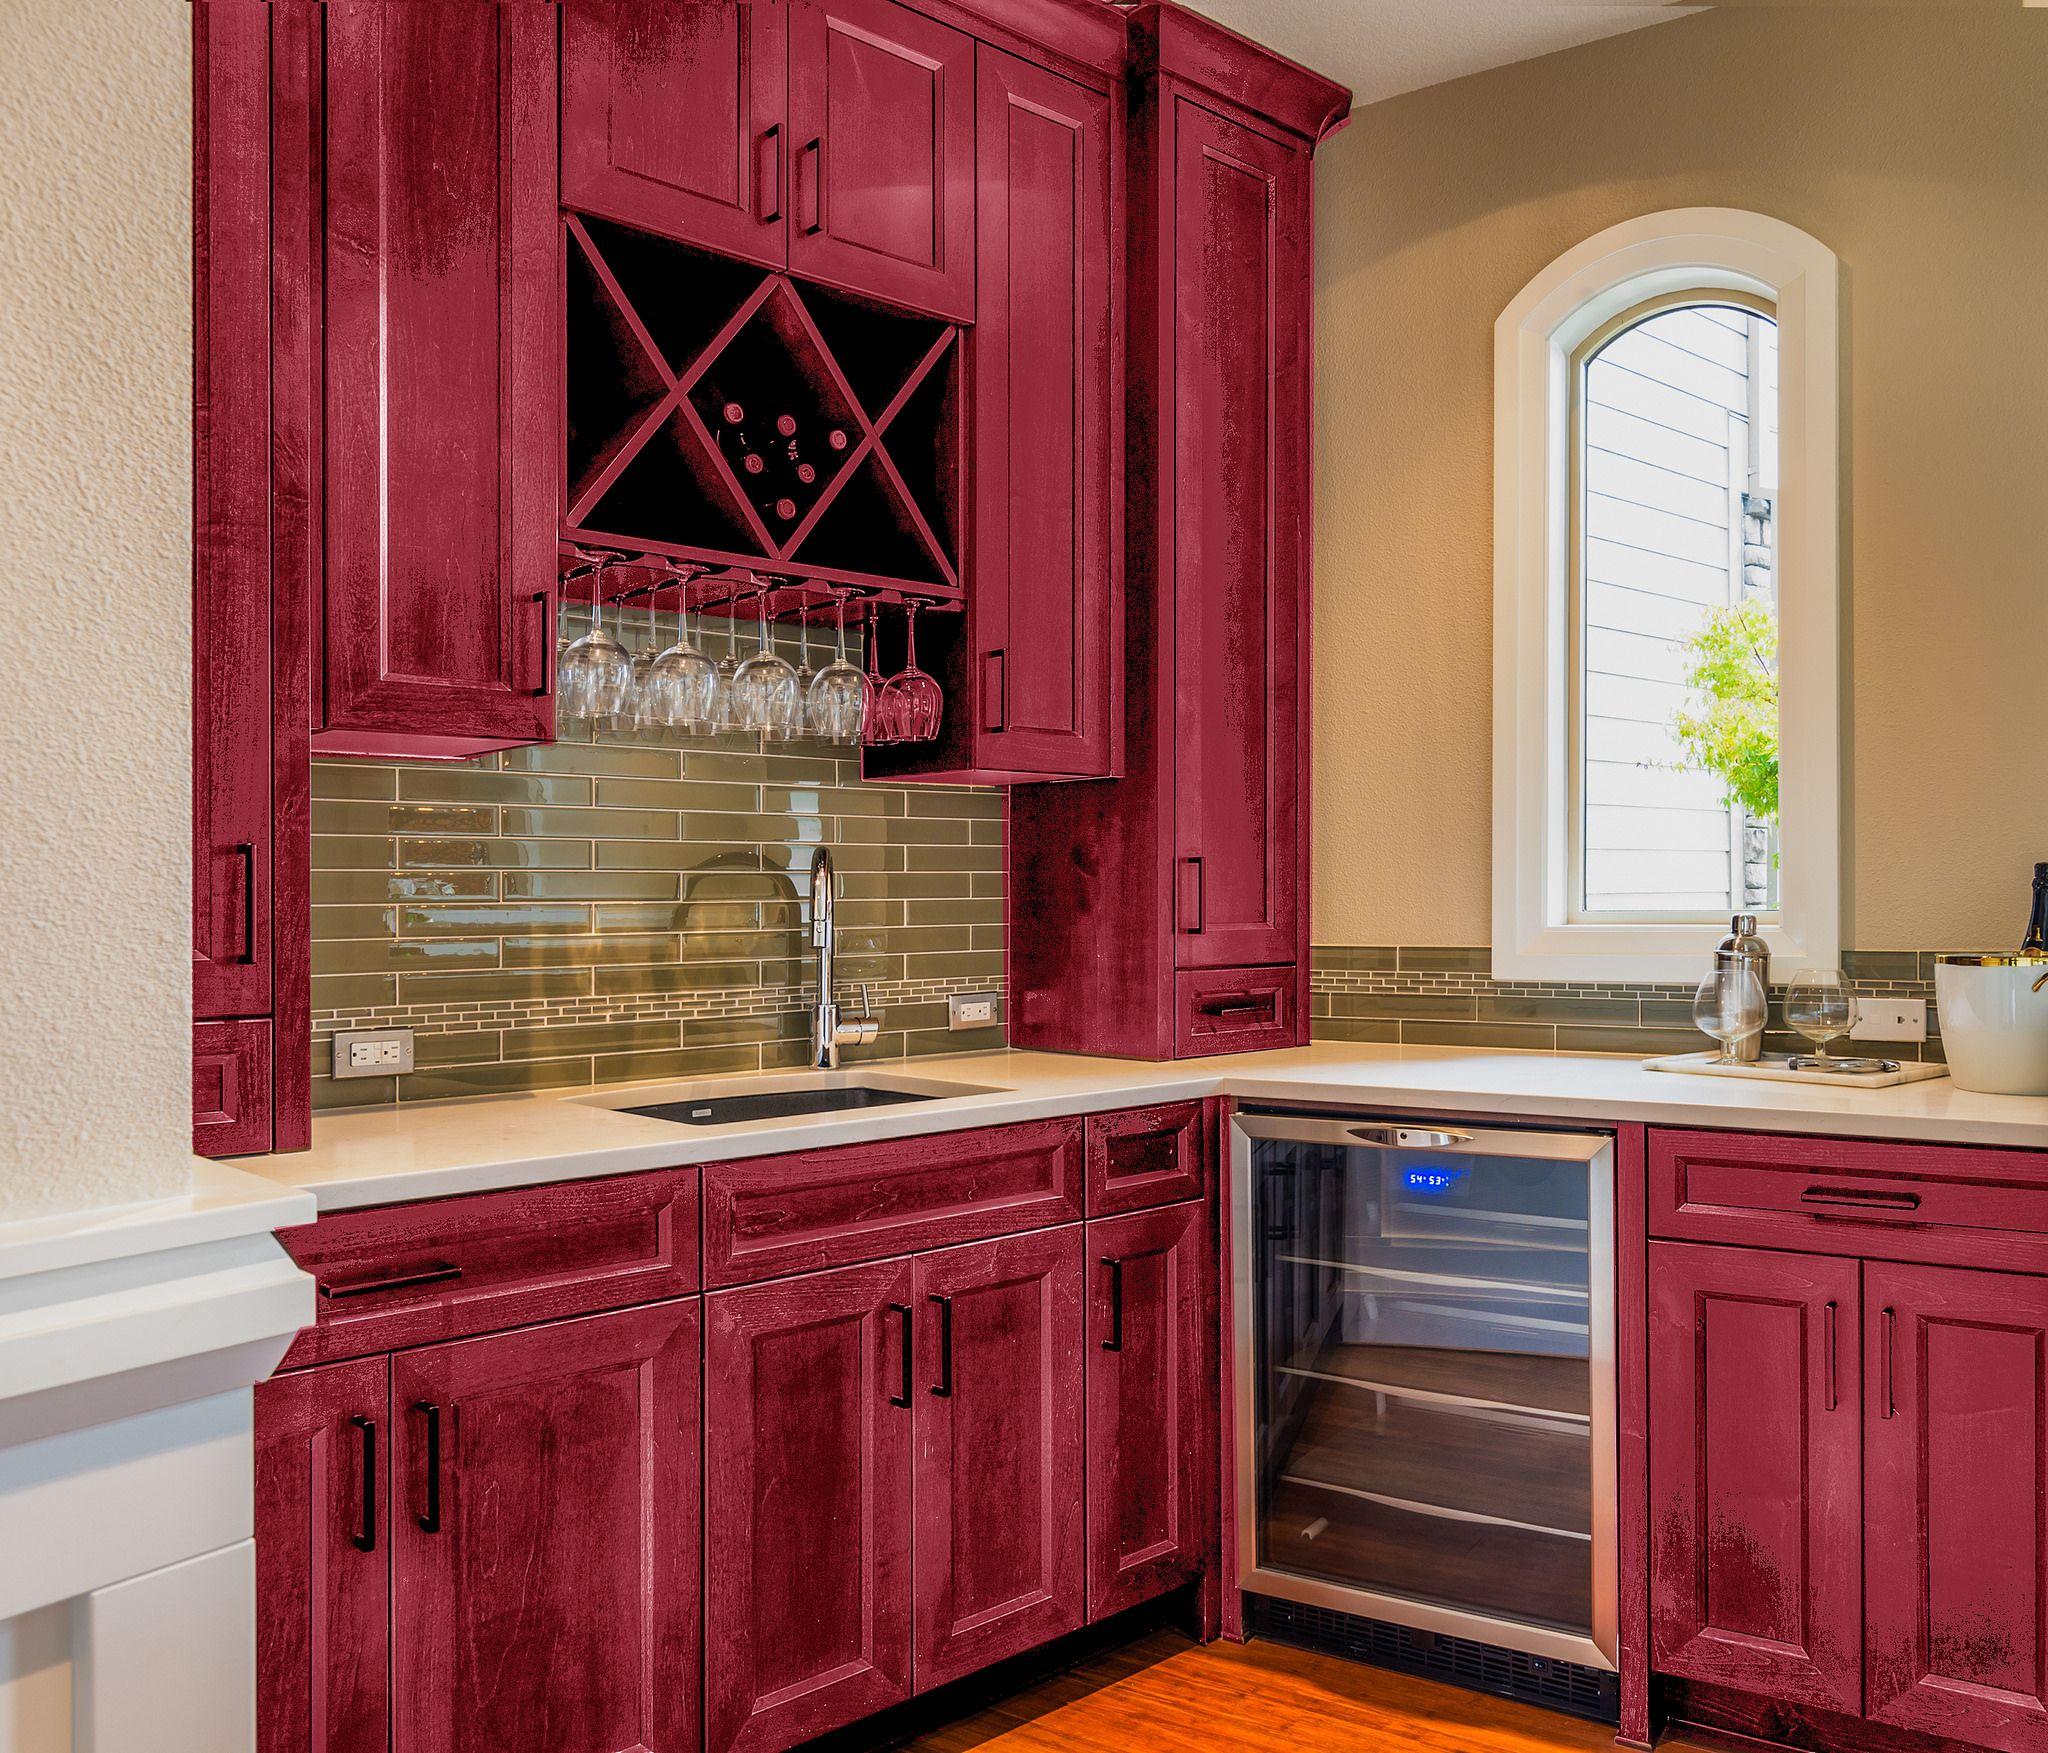 מטבחים בסטייל חדש ומודרני Kitchenpt Kitchen Style Kitchen Rustic Kitchen Decor